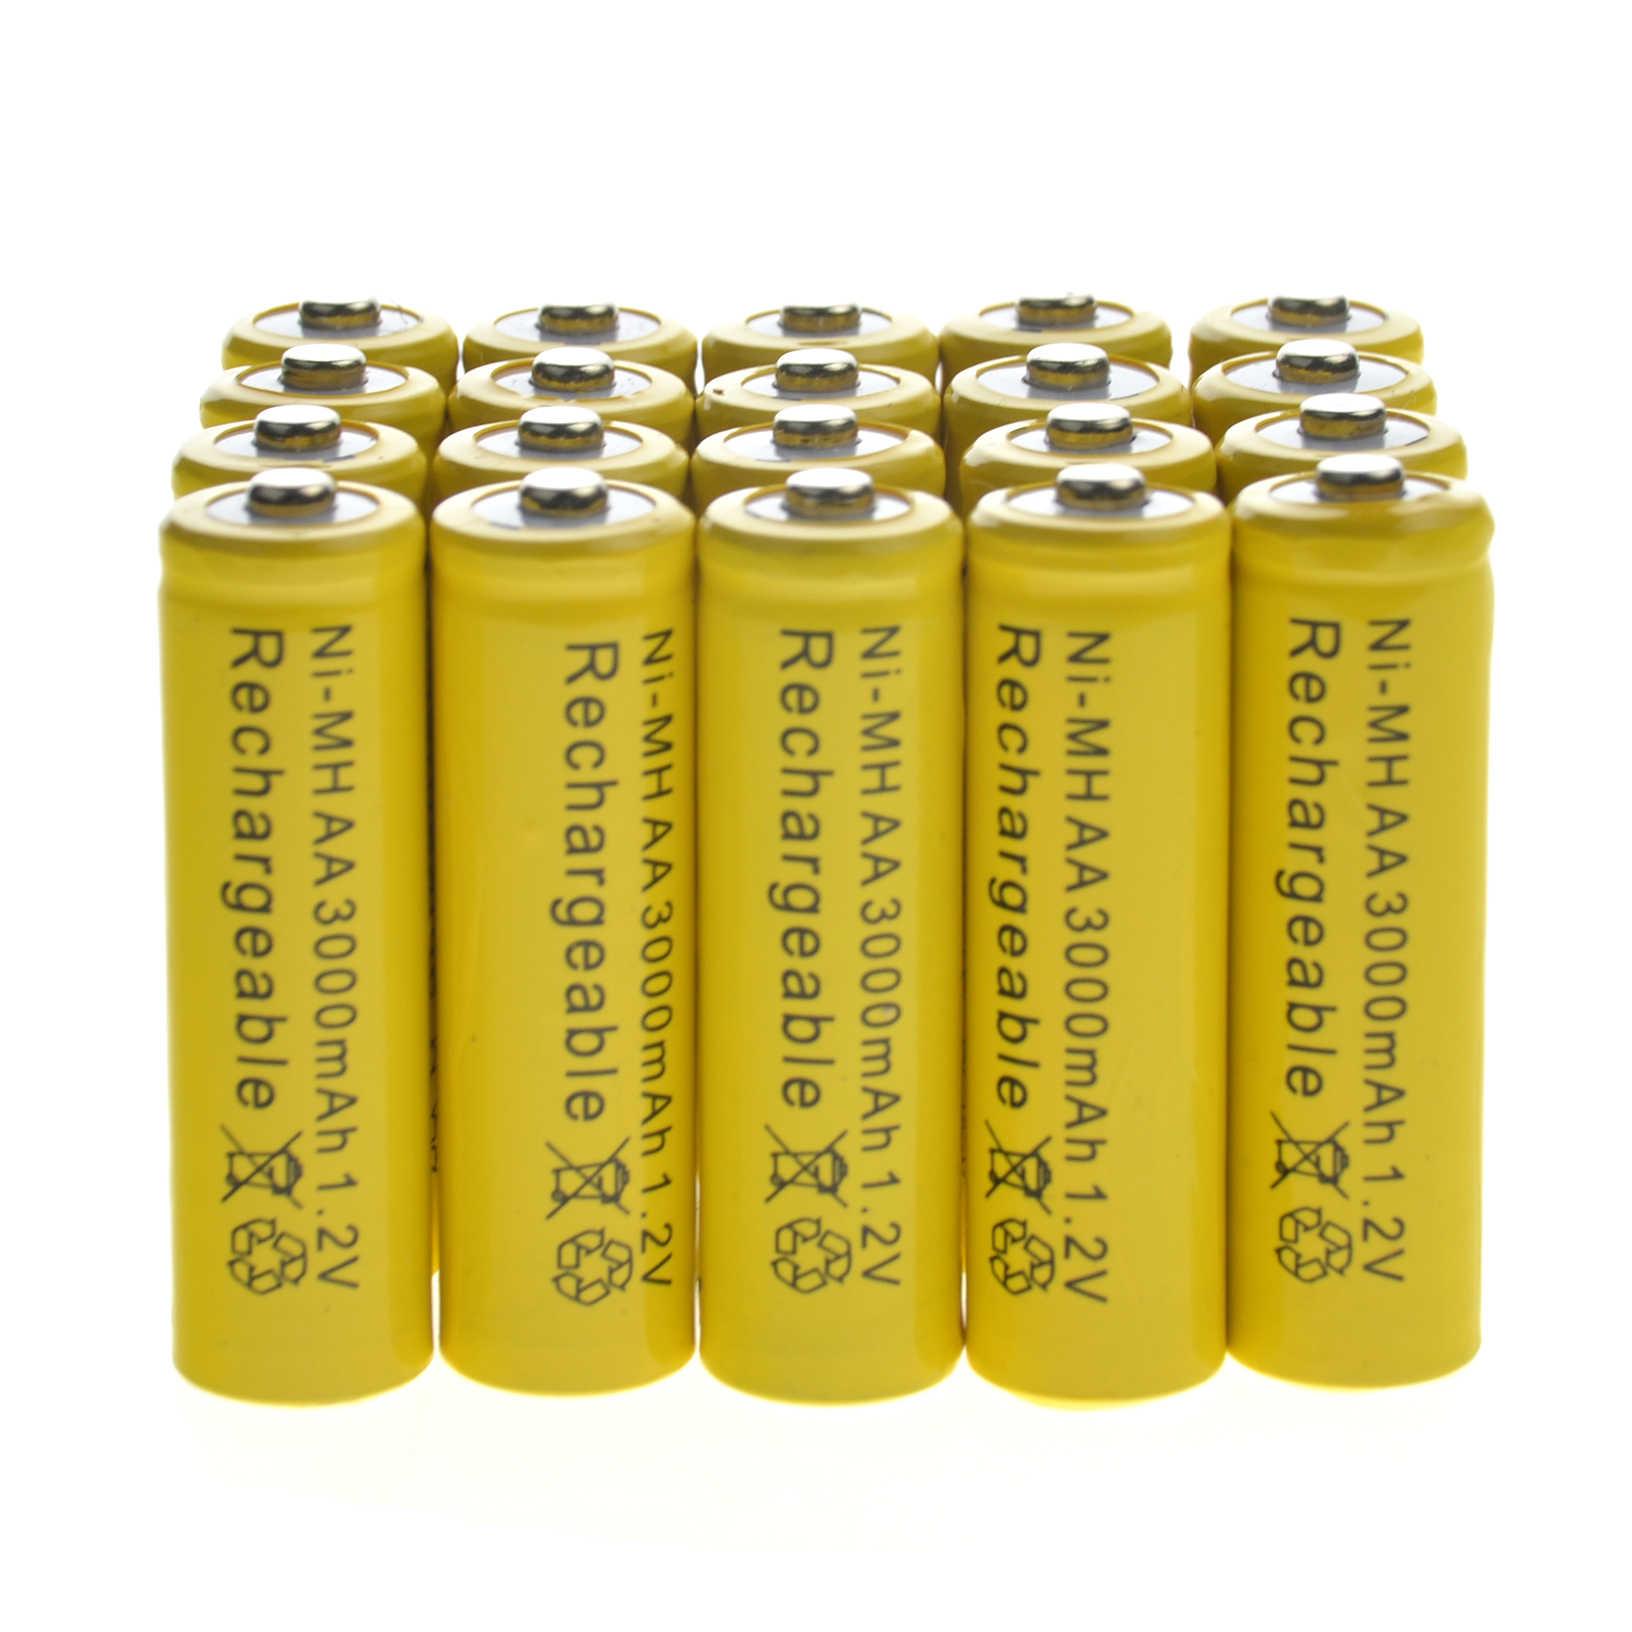 GTF 10pcs 1.2v AA Rechargeable Battery NiMH 3000mAh 1.2V 2A NiMH Bateria for Garden Solar LED Flashlight Toy Cordless Phone